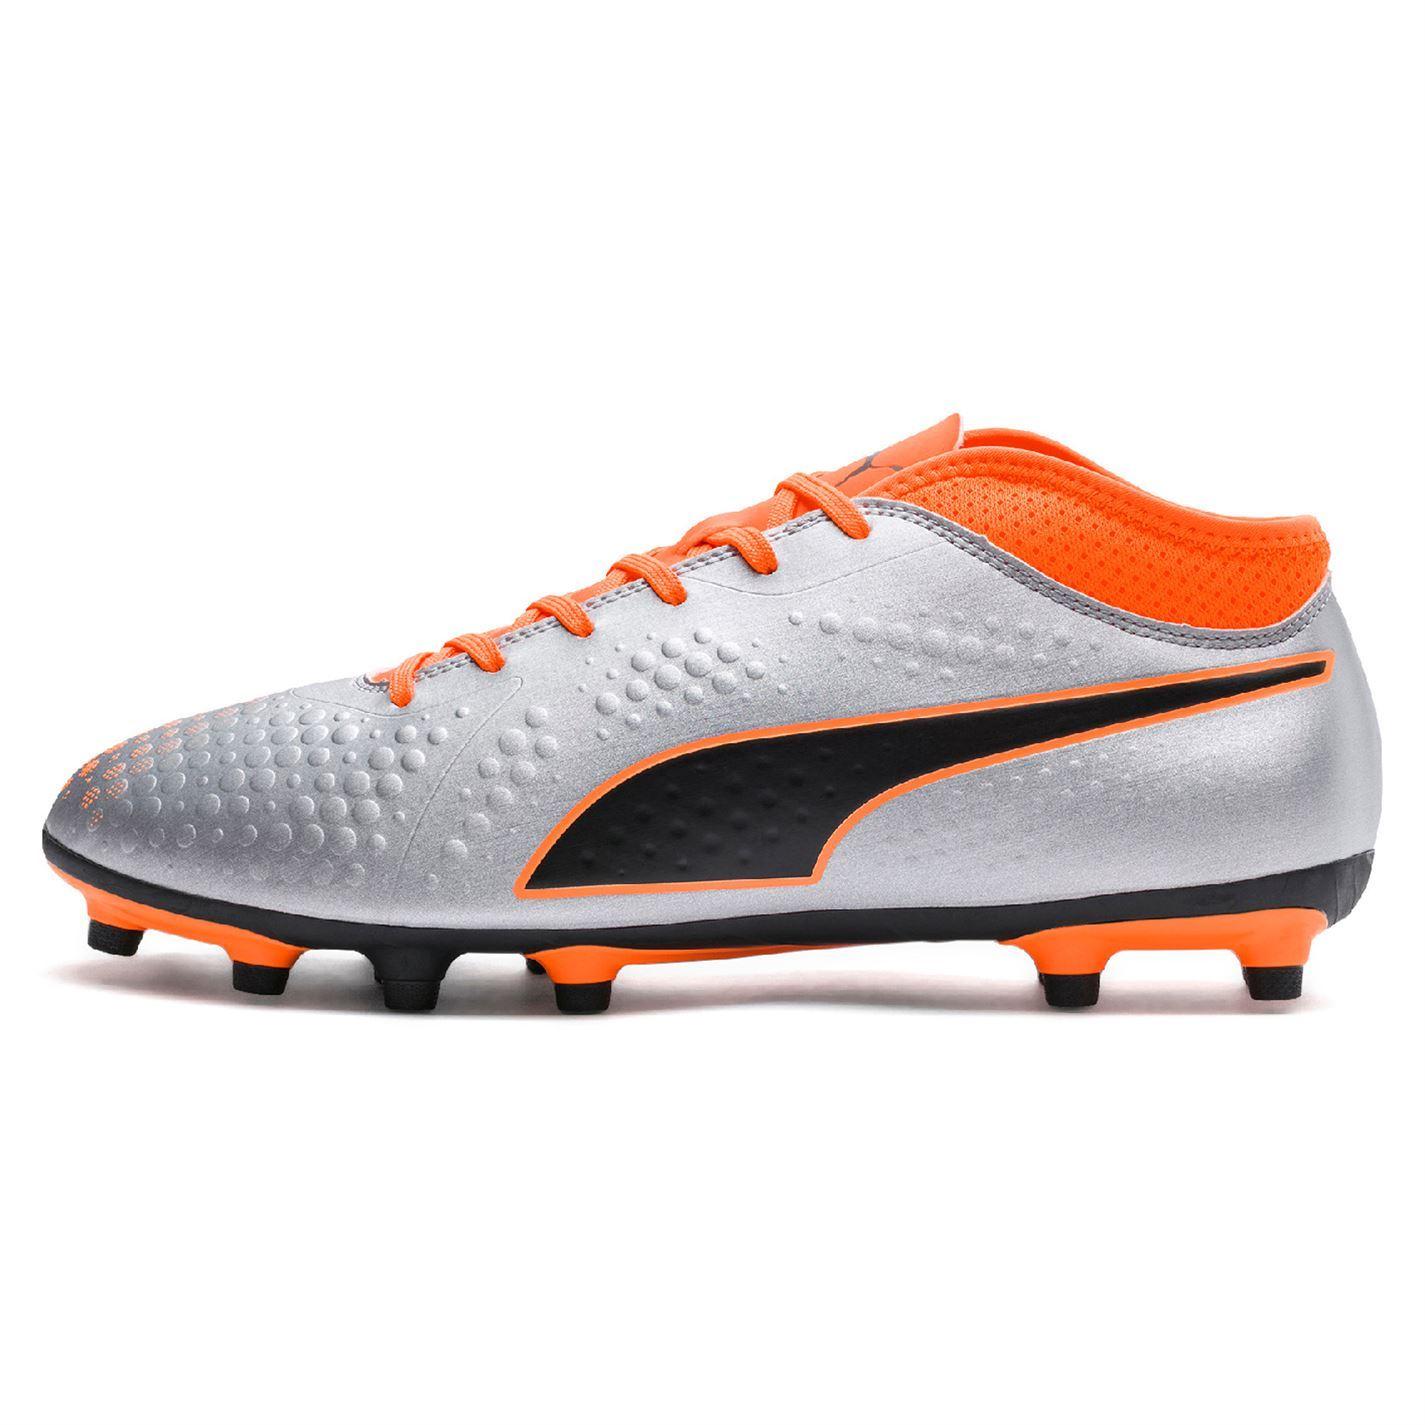 miniature 6 - Puma 4 FG Firm Ground Chaussures De Football Homme Football Chaussures Crampons